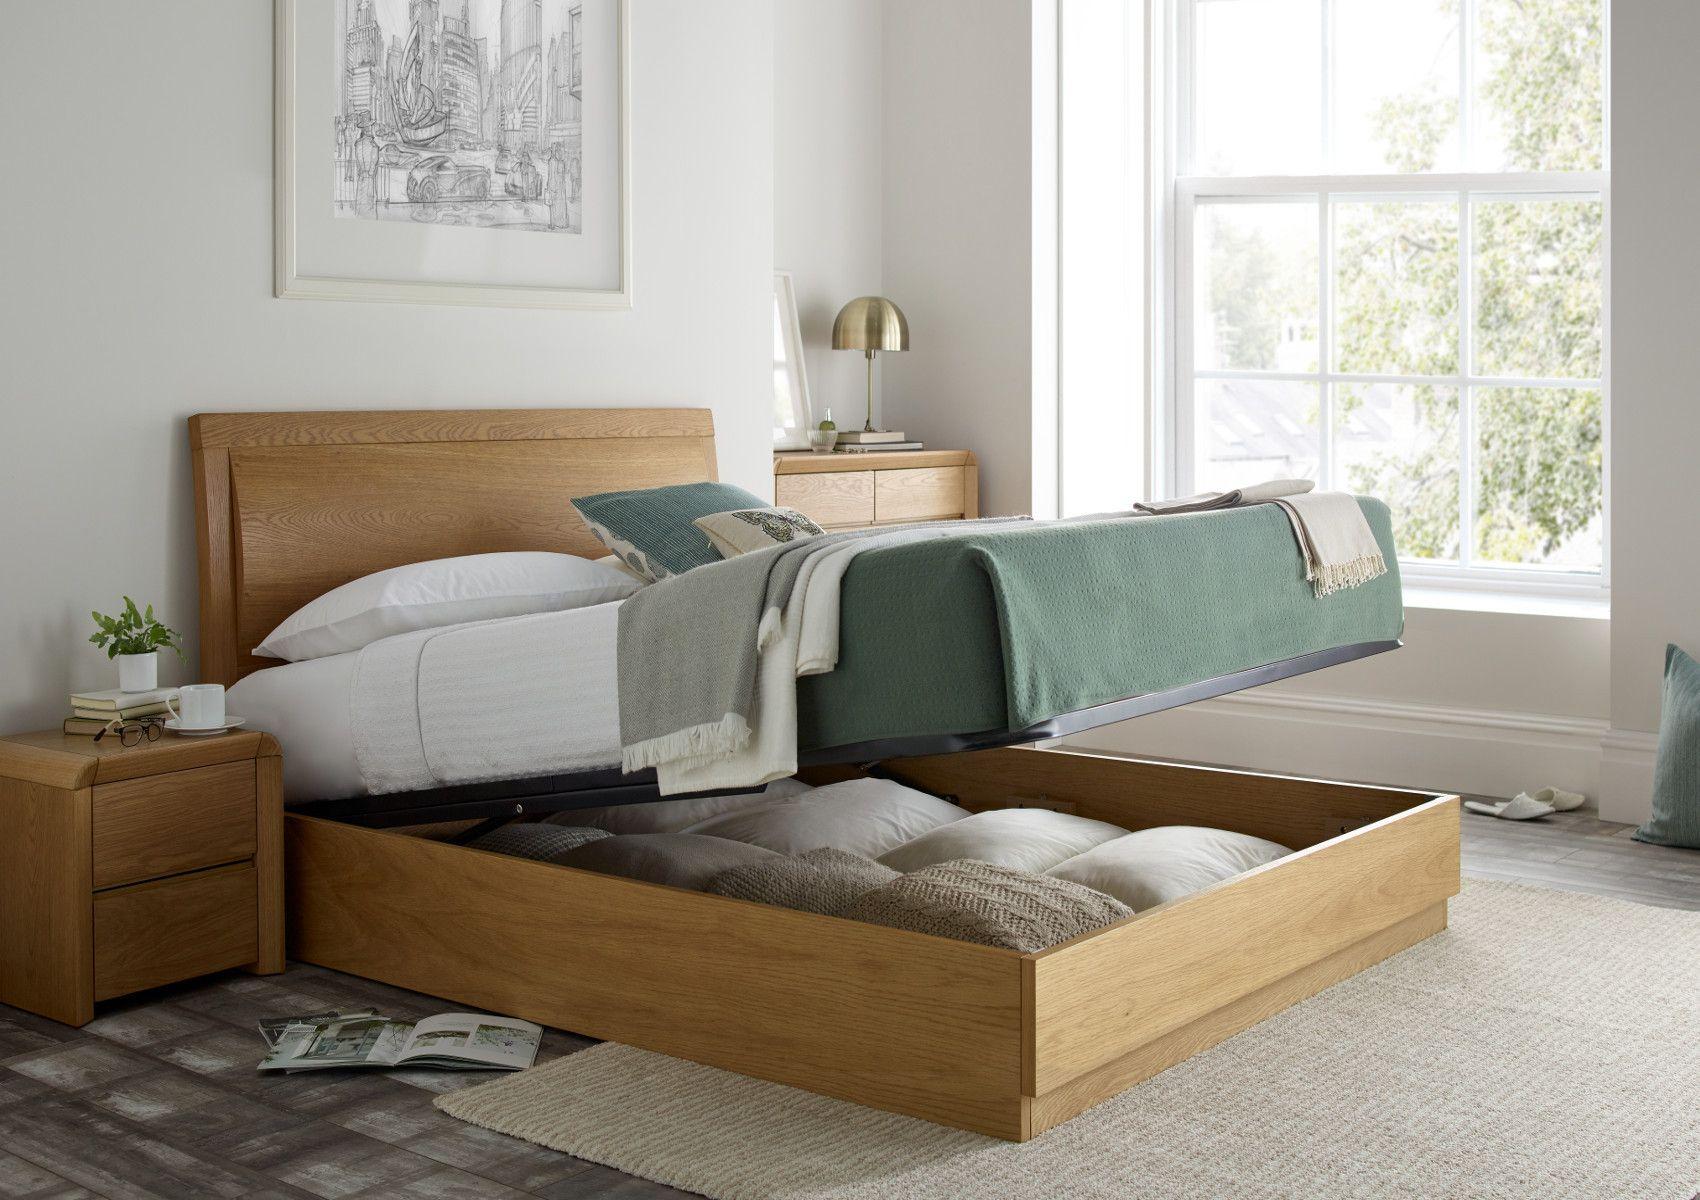 Stupendous Arran Oak Ottoman Storage Bed In 2019 Bedrooms Ottoman Beatyapartments Chair Design Images Beatyapartmentscom